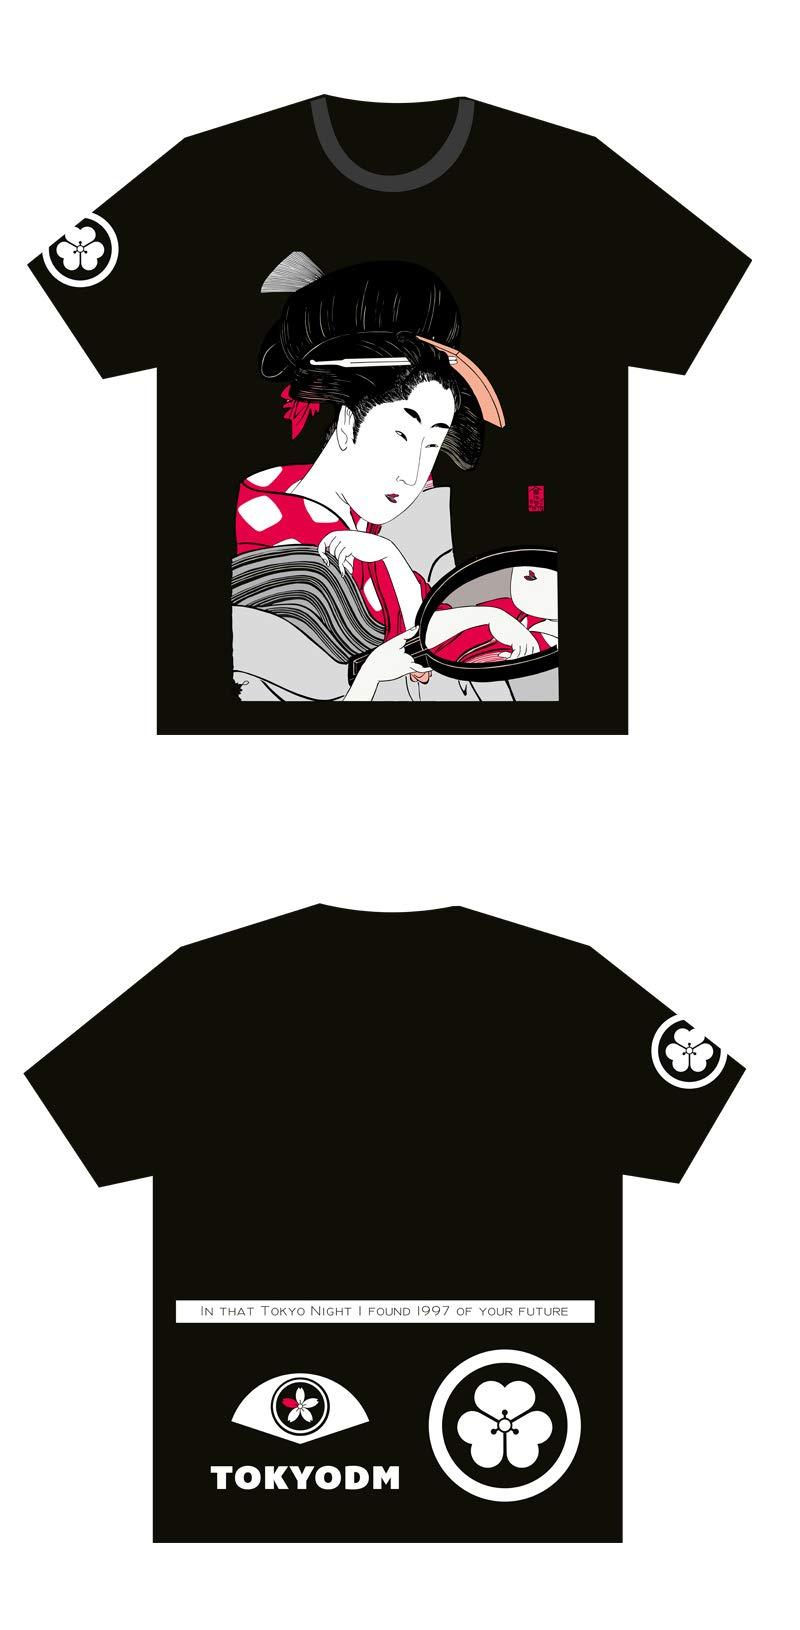 TOKYODM Japanese Ukiyo Geisha Cherry Blossom Printing Loose Black T-Shirt Short Sleeve Japanese Style Tee (s)